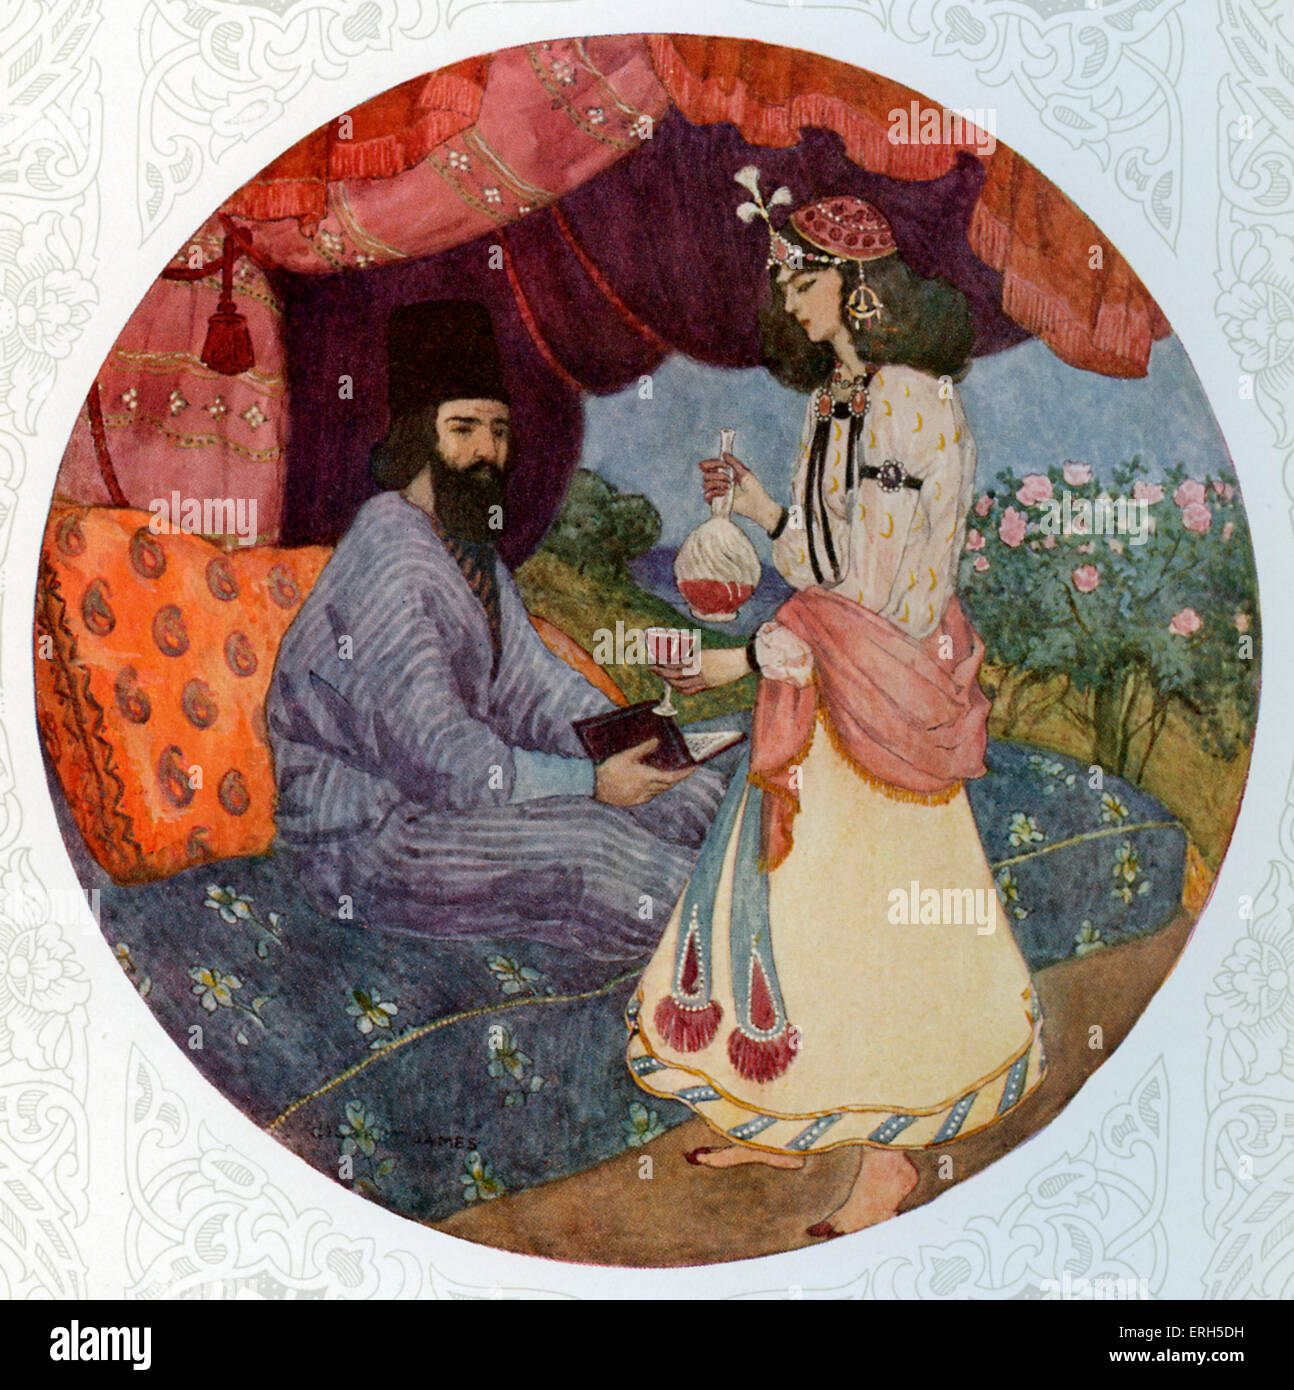 Rubaiyat of Omar Khayyam, translated  by Edward FitzGerald ( translation of a selection of poems, originally written - Stock Image